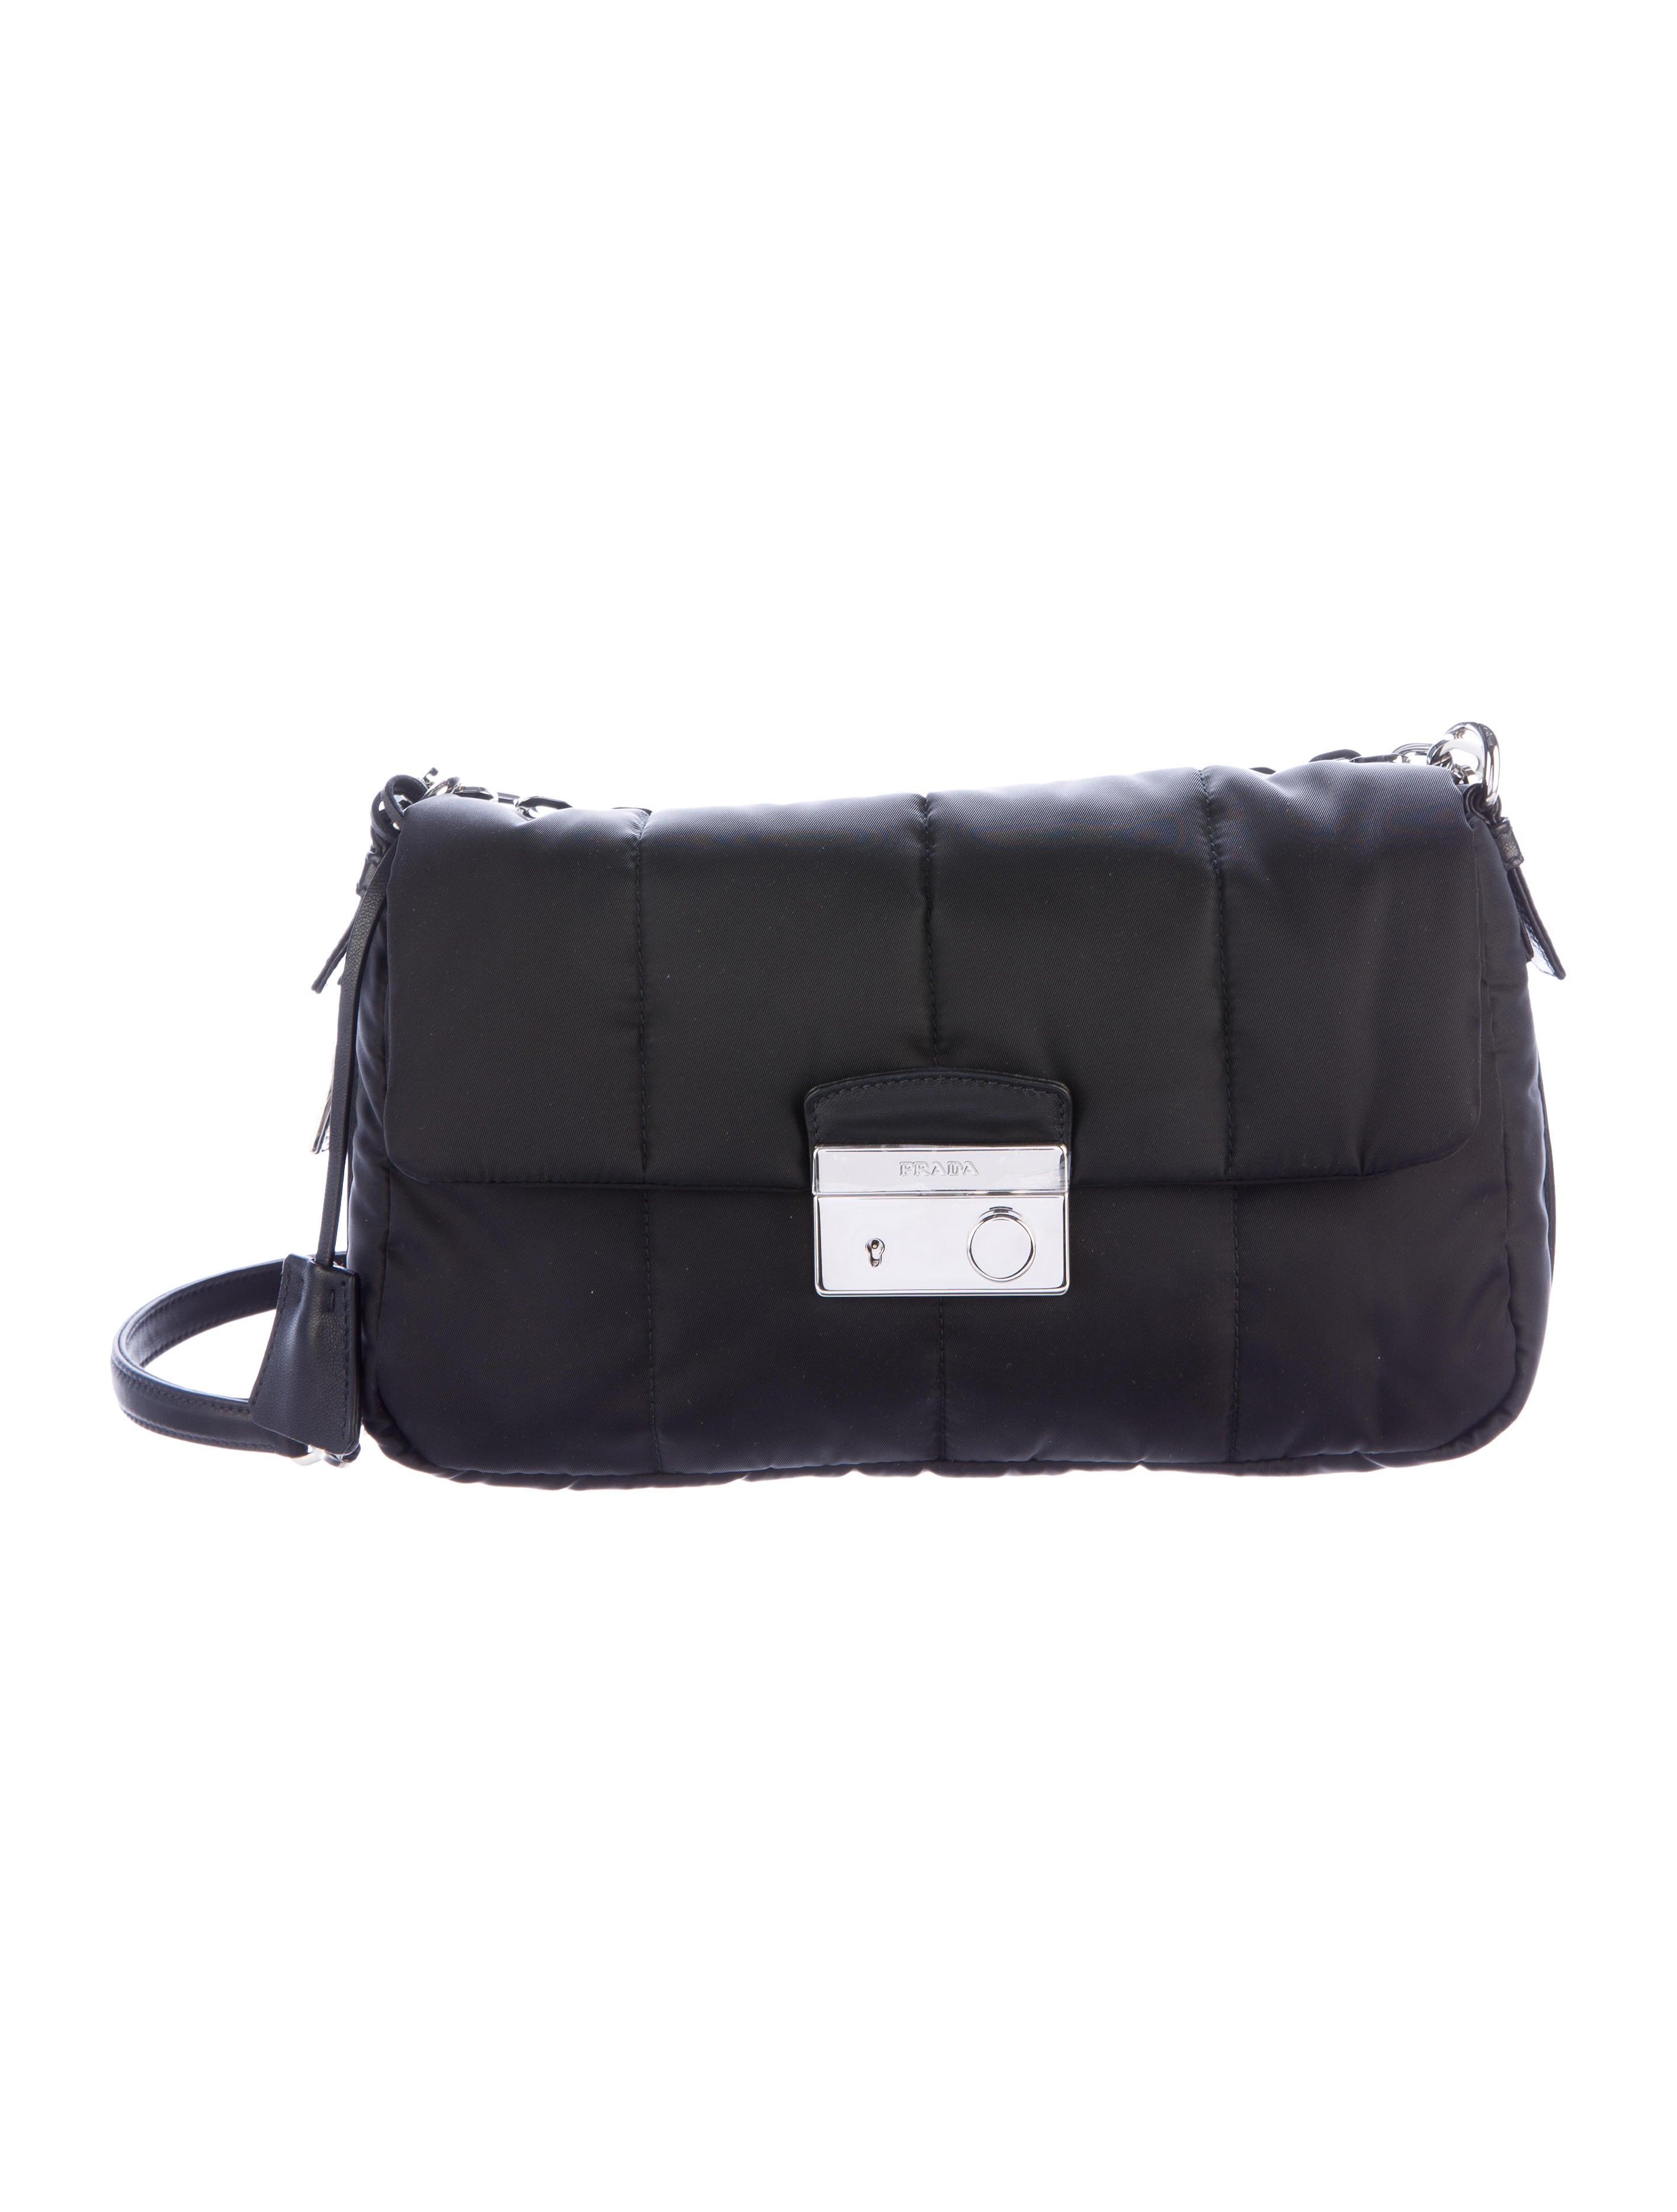 a8ad07682725 Prada Quilted Tessuto Crossbody Bag - Handbags - PRA146566 | The RealReal